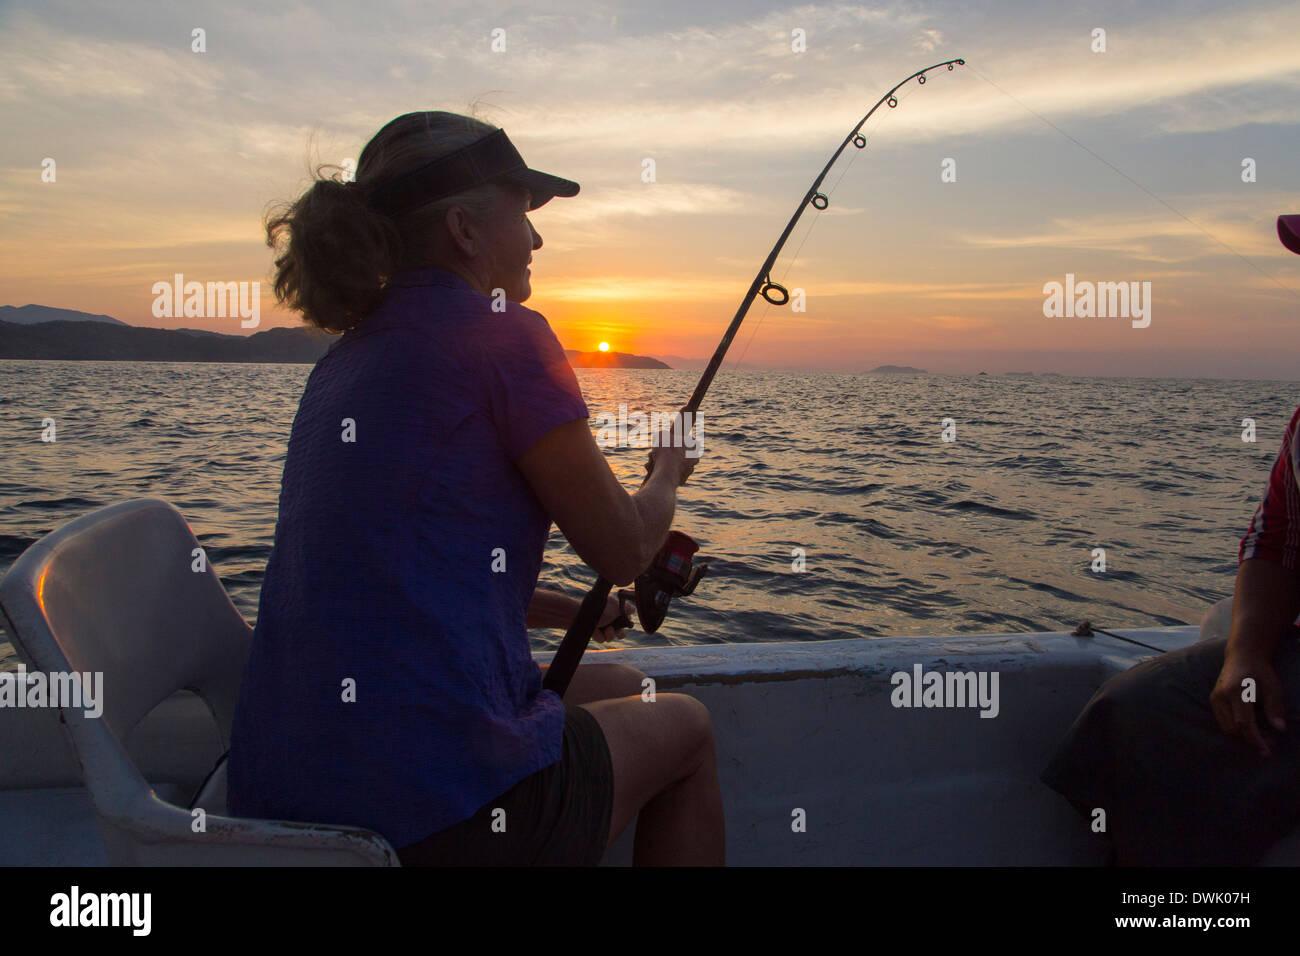 Fishing, Zihuatanejo, Ixtapa, Guerrero, Mexico - Stock Image